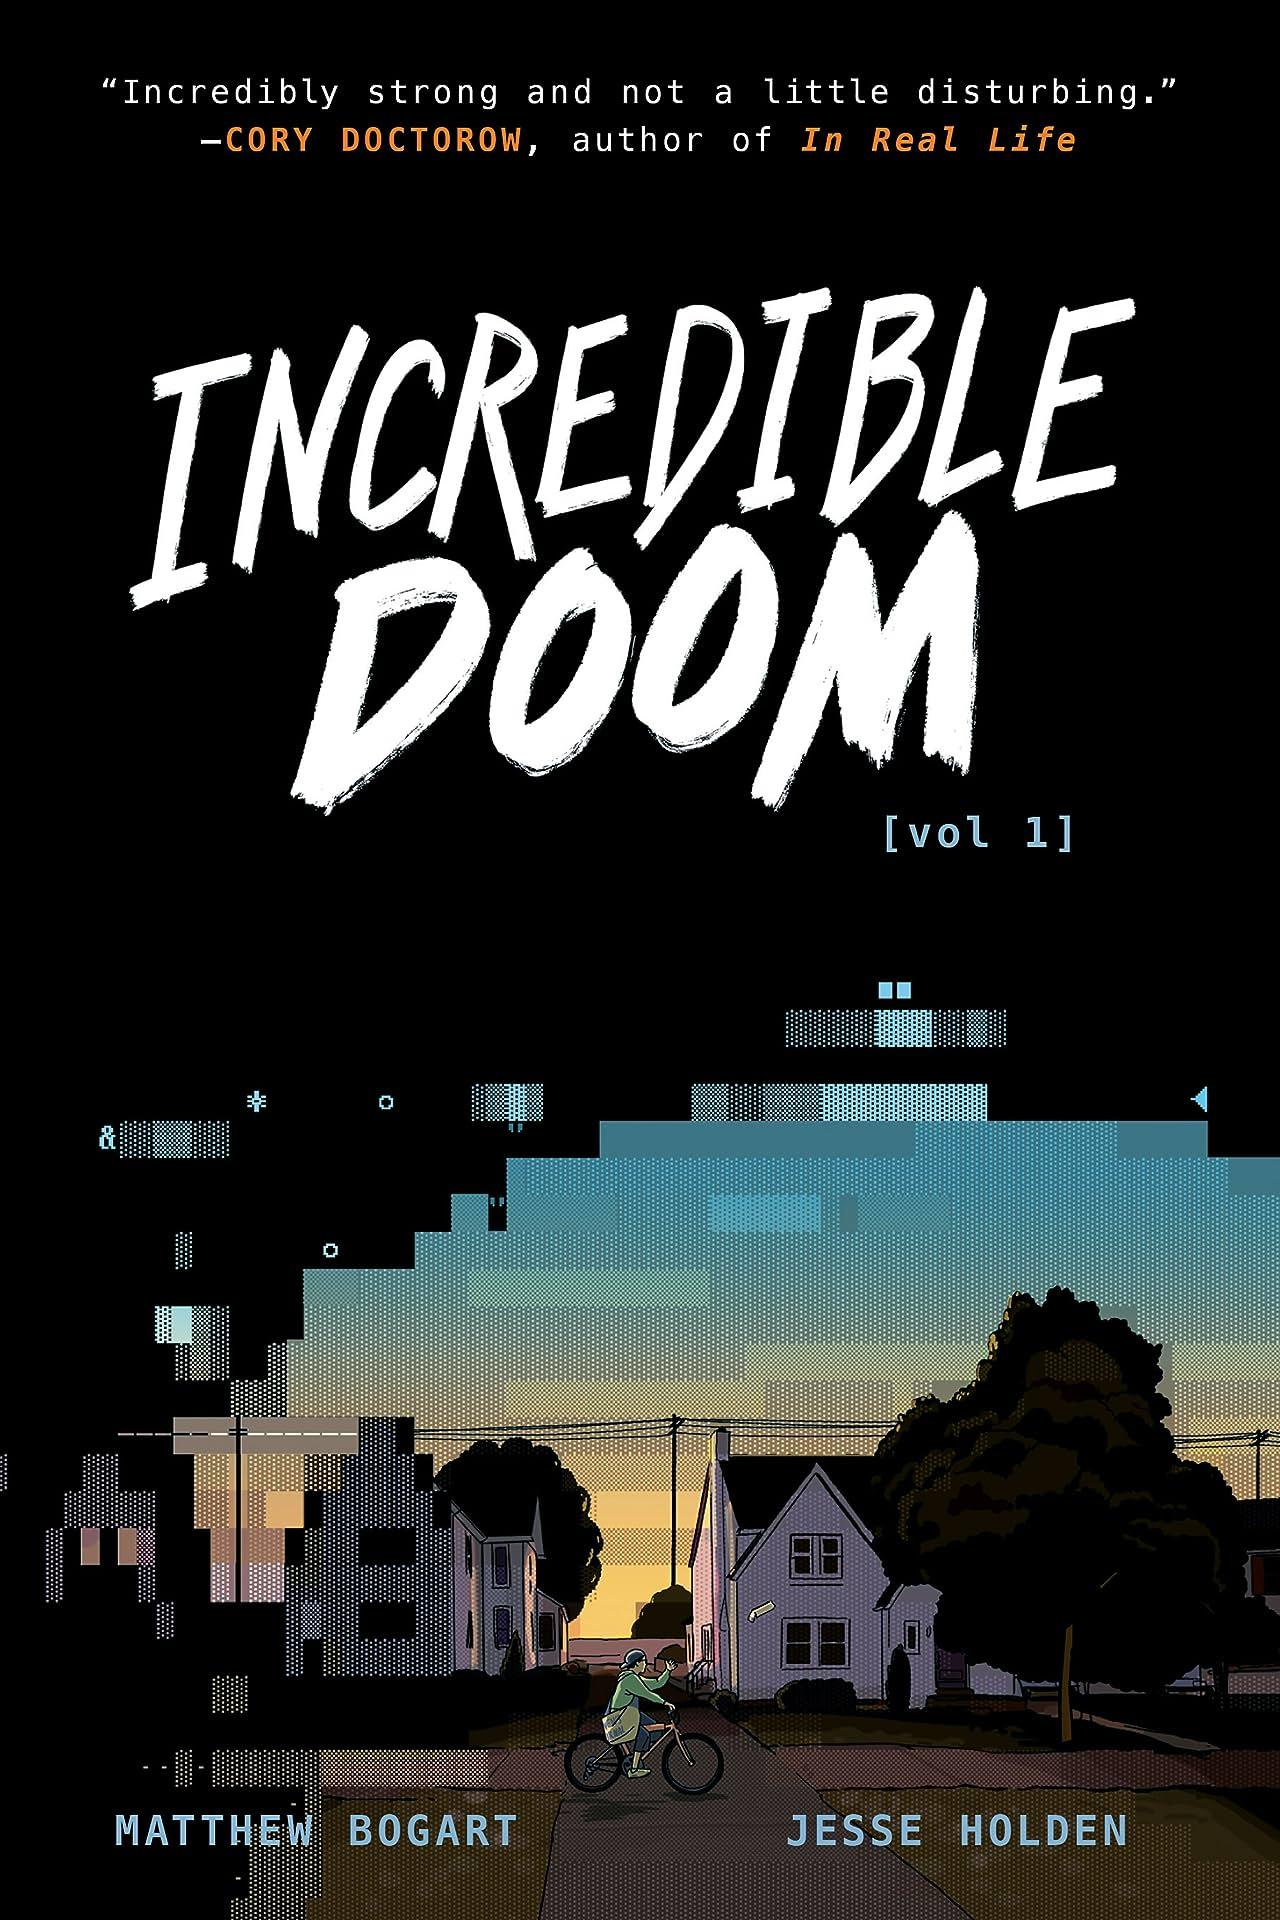 Incredible Doom Vol. 1